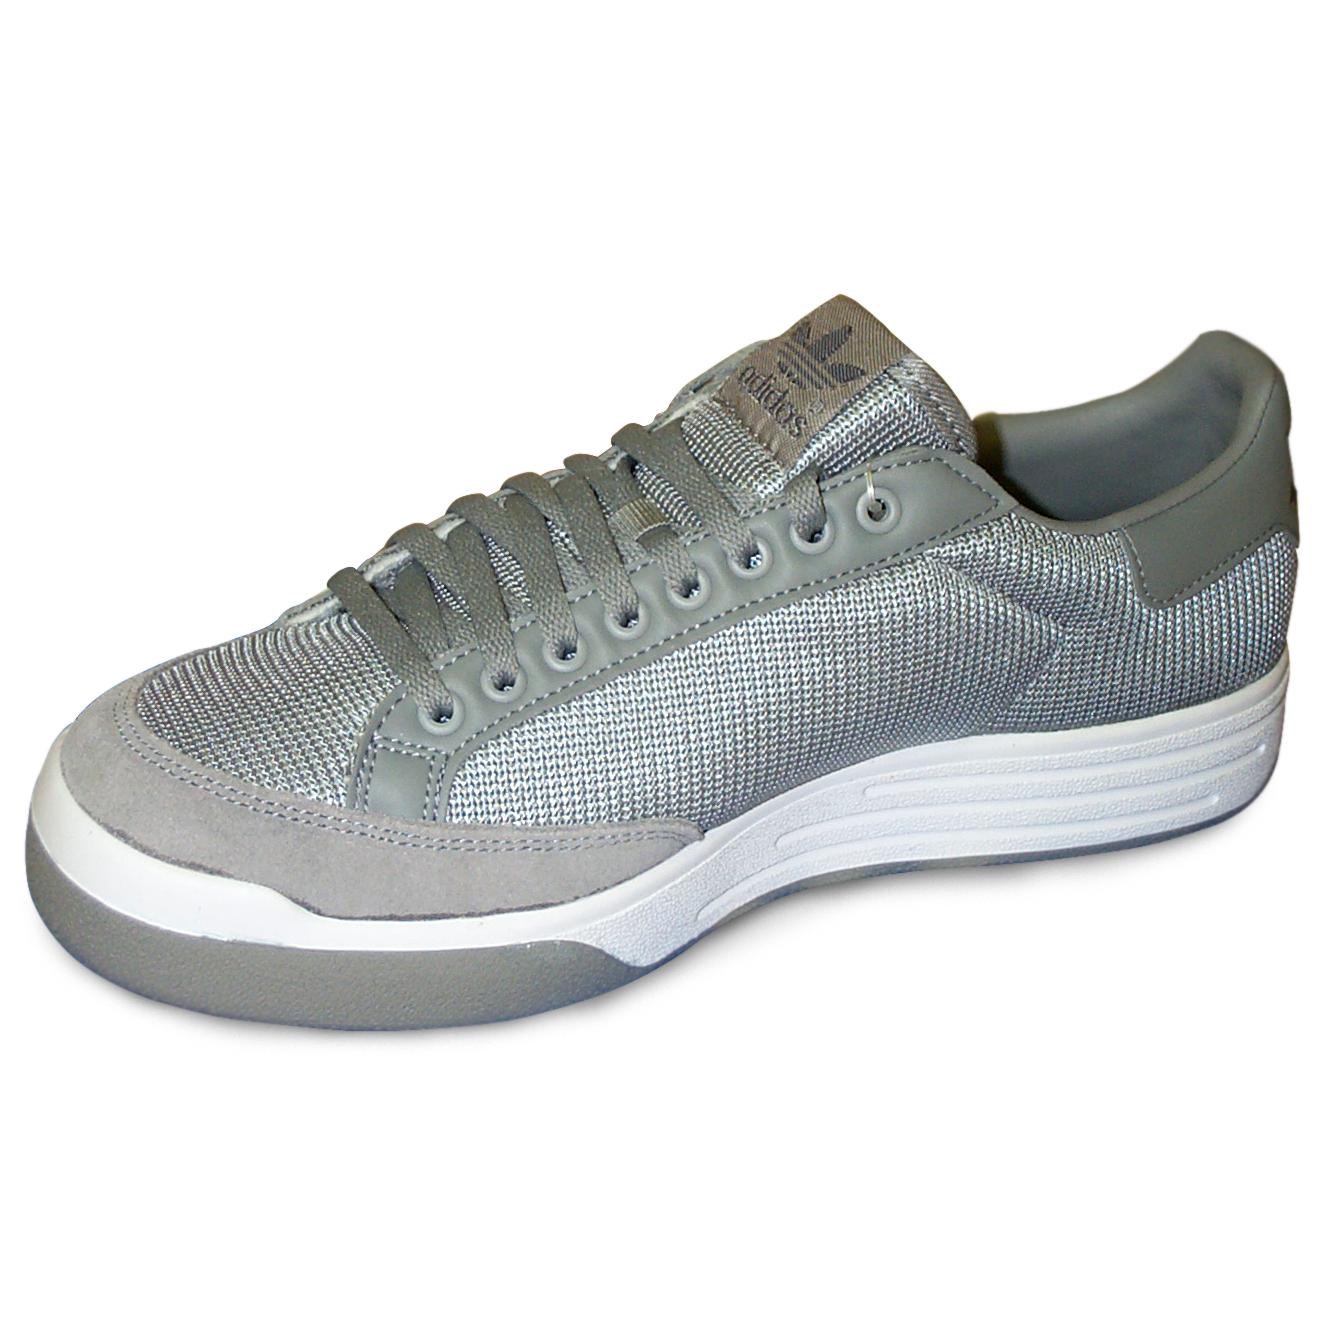 Adidas Rod Laver Shoes Black